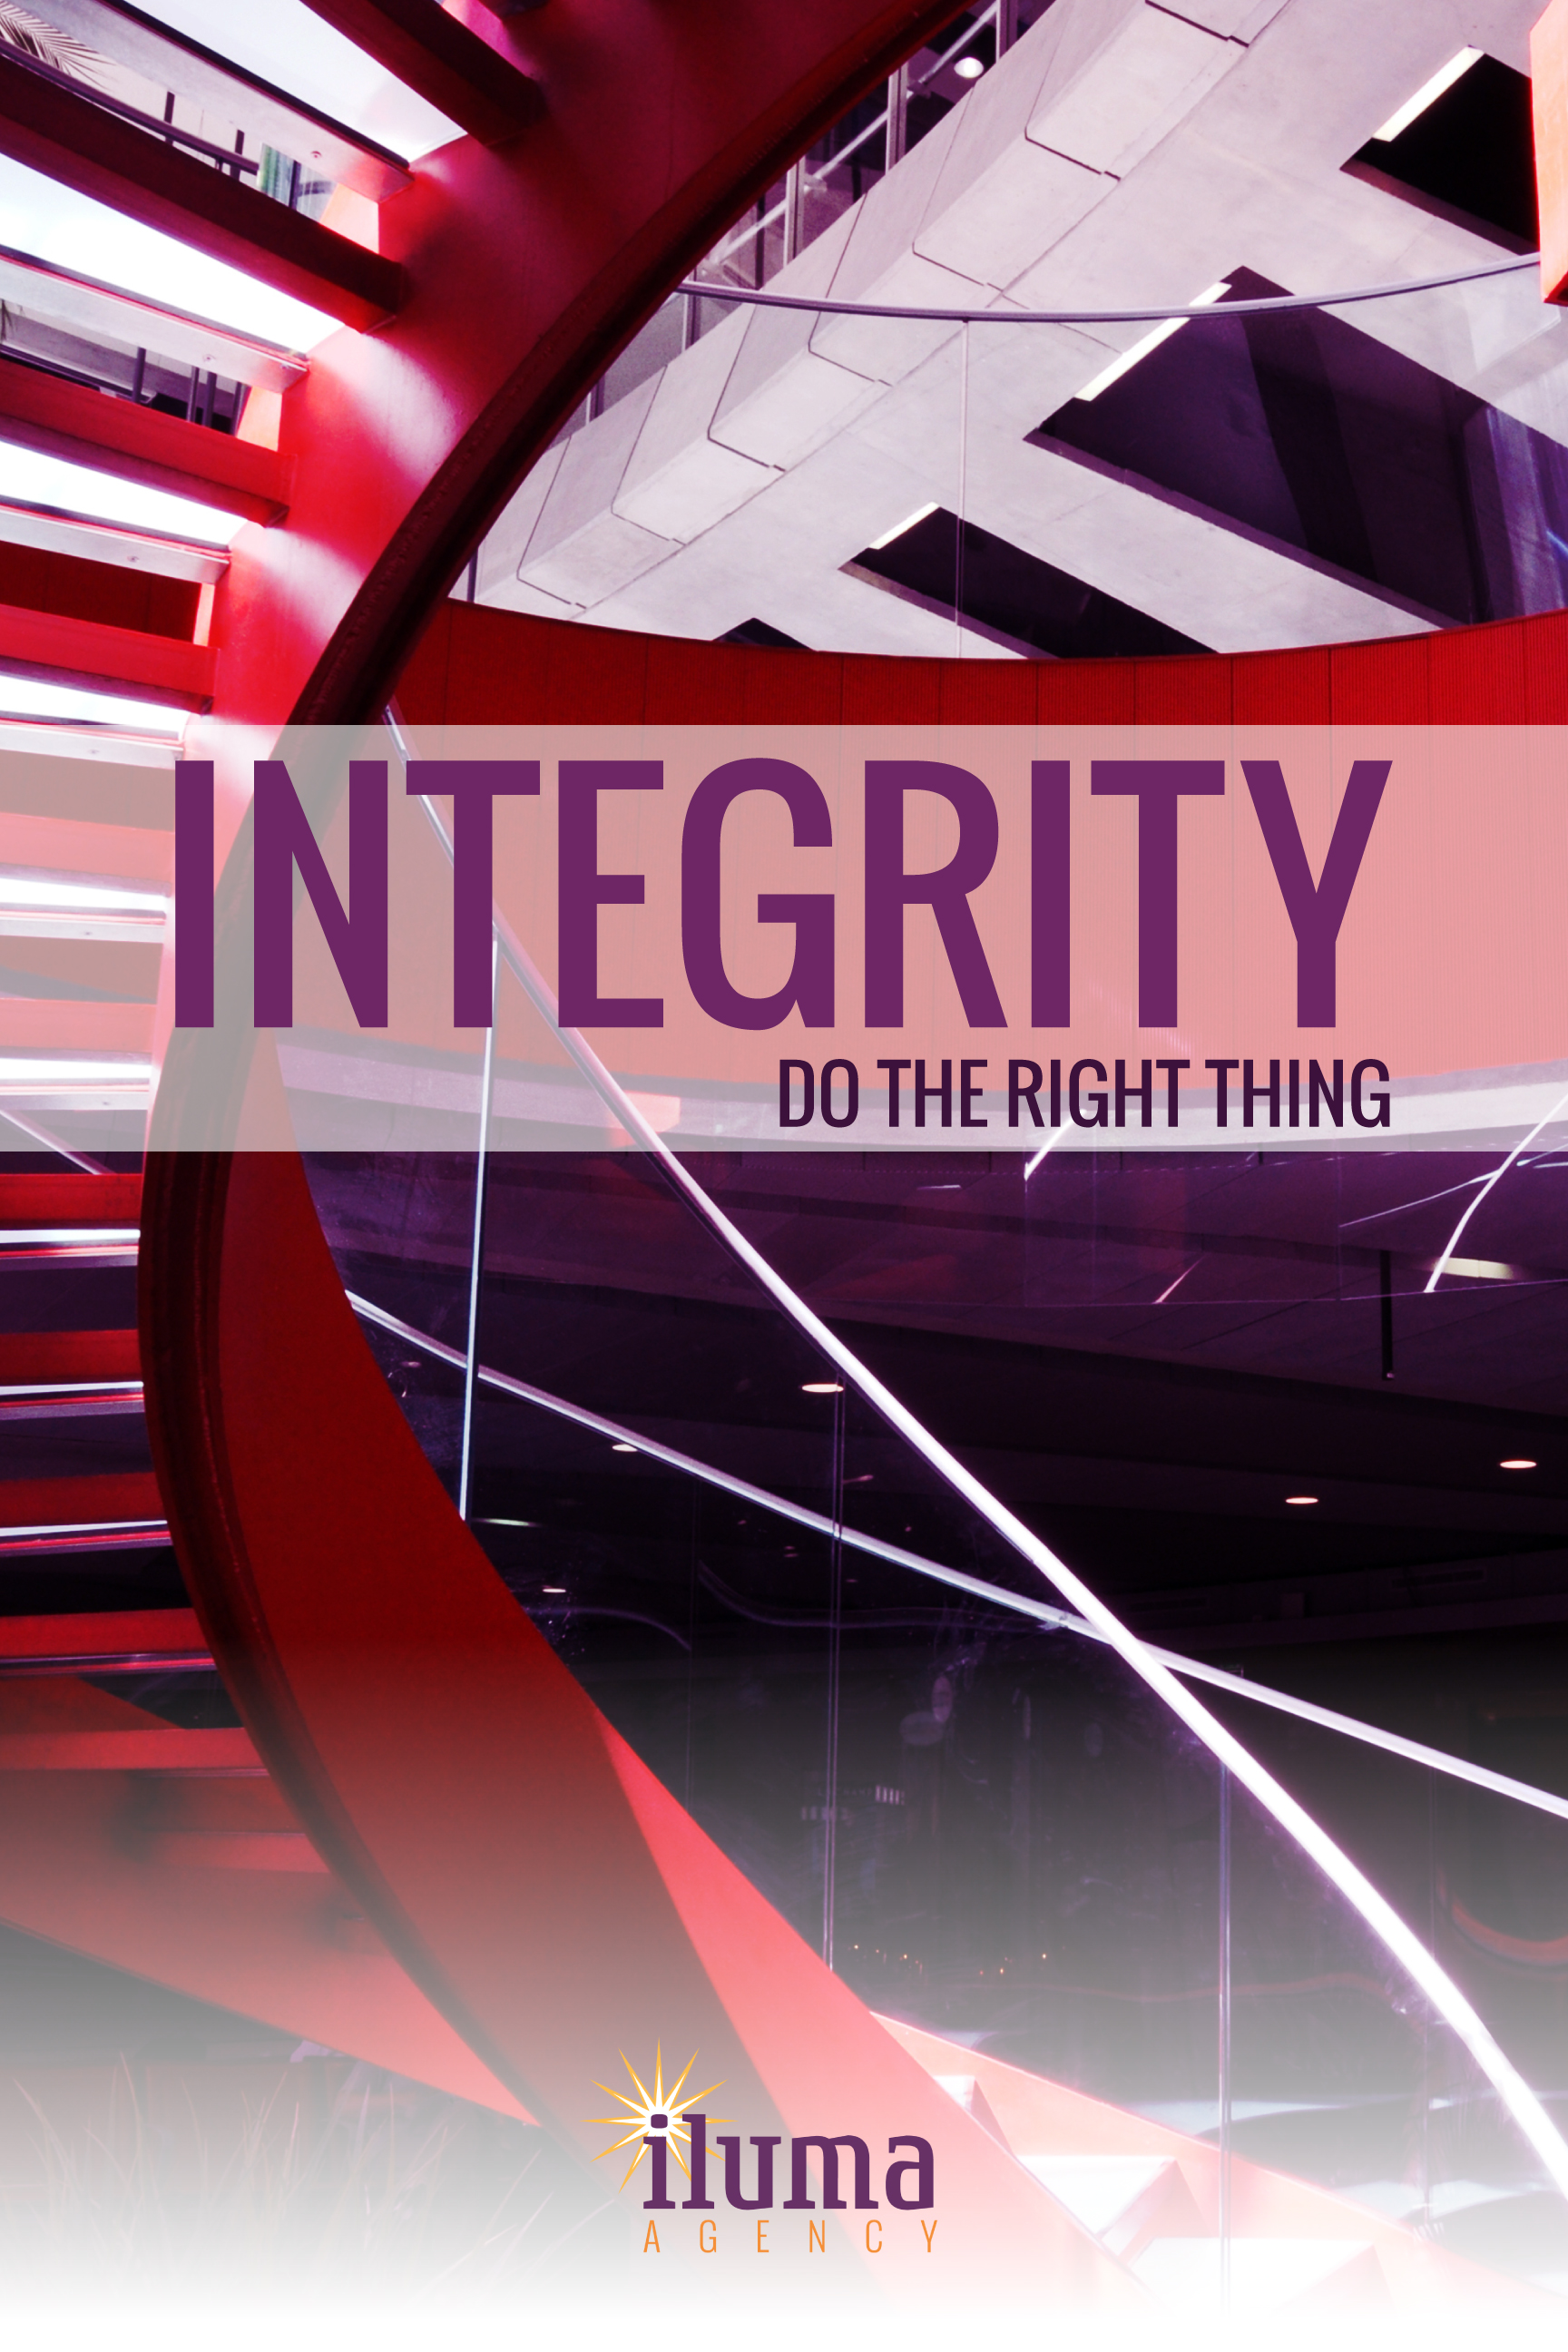 Integrity_24x36_Proof04.jpg